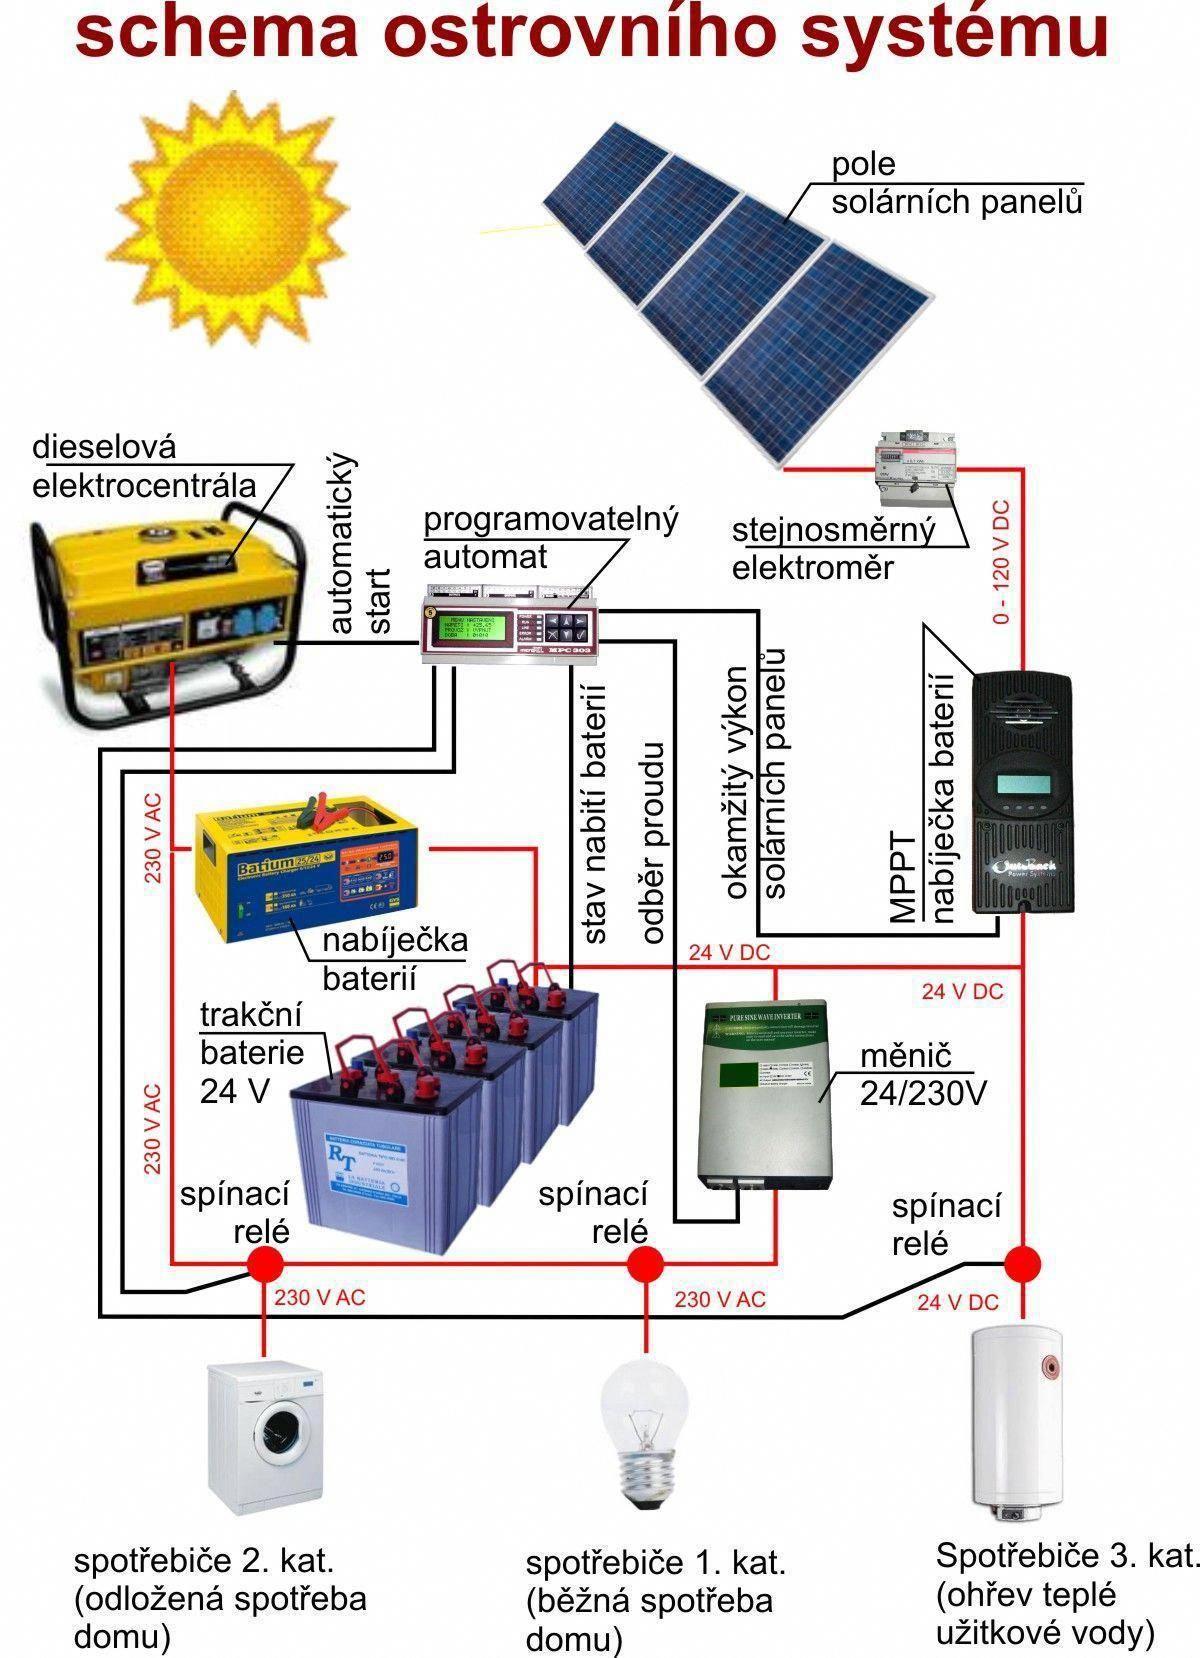 Fve Ostrovni System Ostrovnidum Cz Solarenergy Solarpanels Solarpower Solarpanelsforhome Solarpanelkits Solarpower Solar Projects Solar Panels Solar Heating